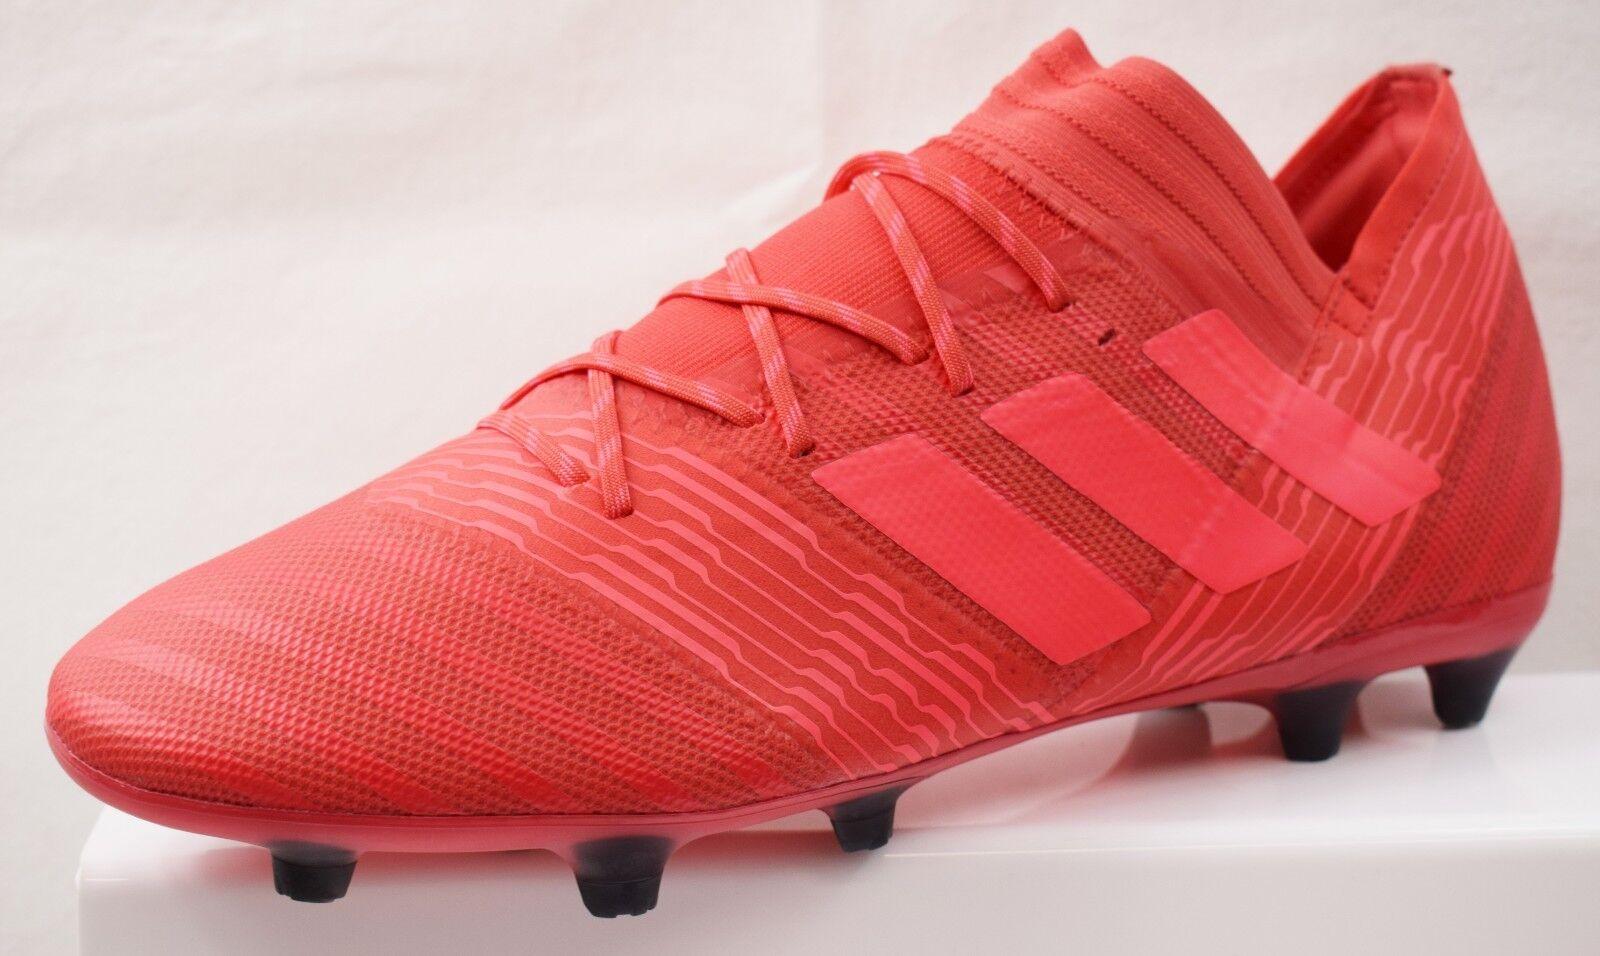 Adidas nemeziz 17.2 FG botas de fútbol para hombres nuevo tamaño de Reino Unido 10 (EC7)